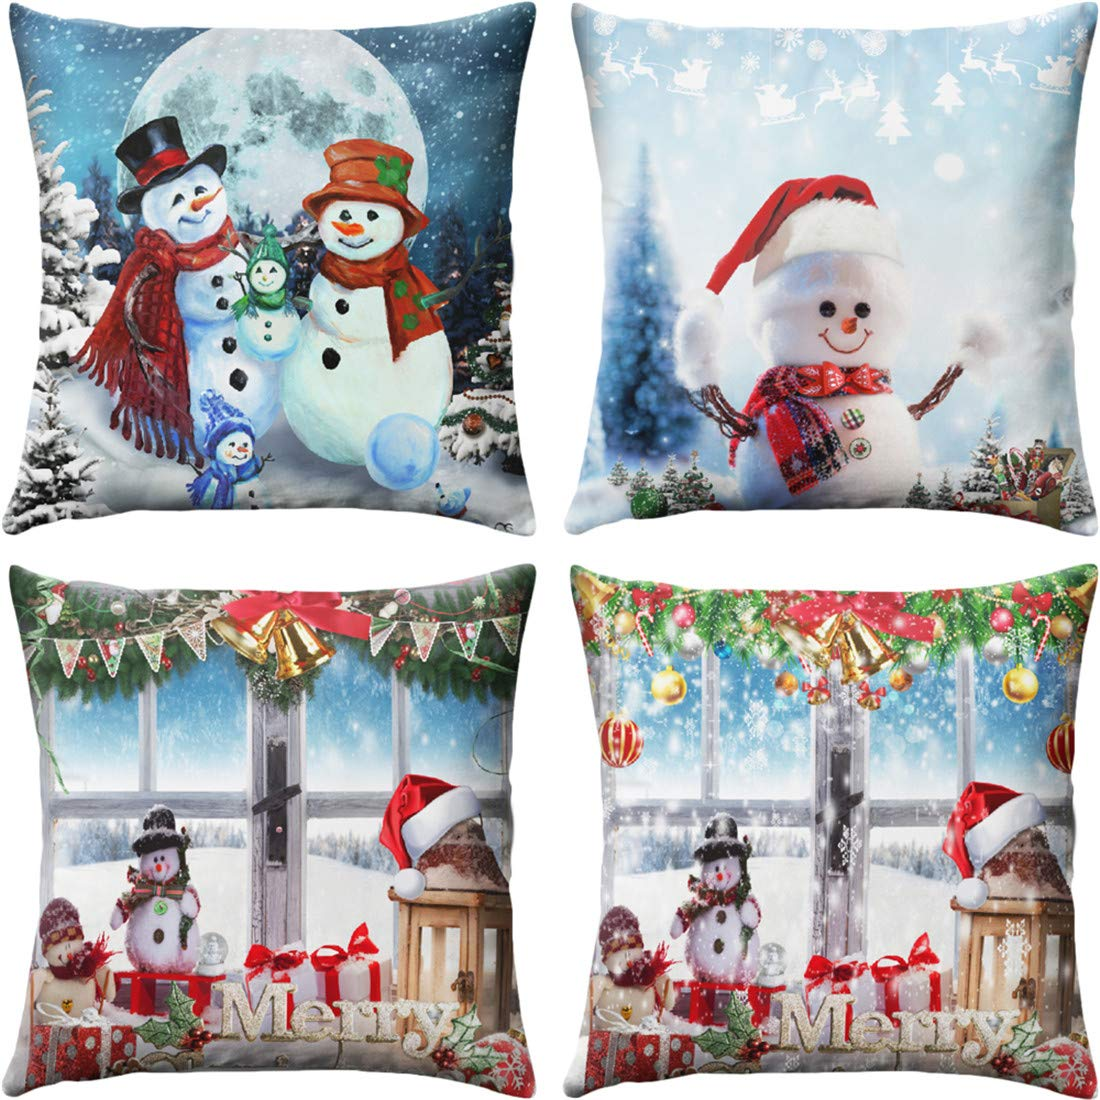 "4 PCS Christmas Pillow Covers 18"" x 18"" Throw Pillow Covers Decorative Pillowcases Christmas Theme Snowman Soft Linen Cotton Design Cushion Cover for Sofa,Bedroom,Chair,Car Seat,Farmhouse"